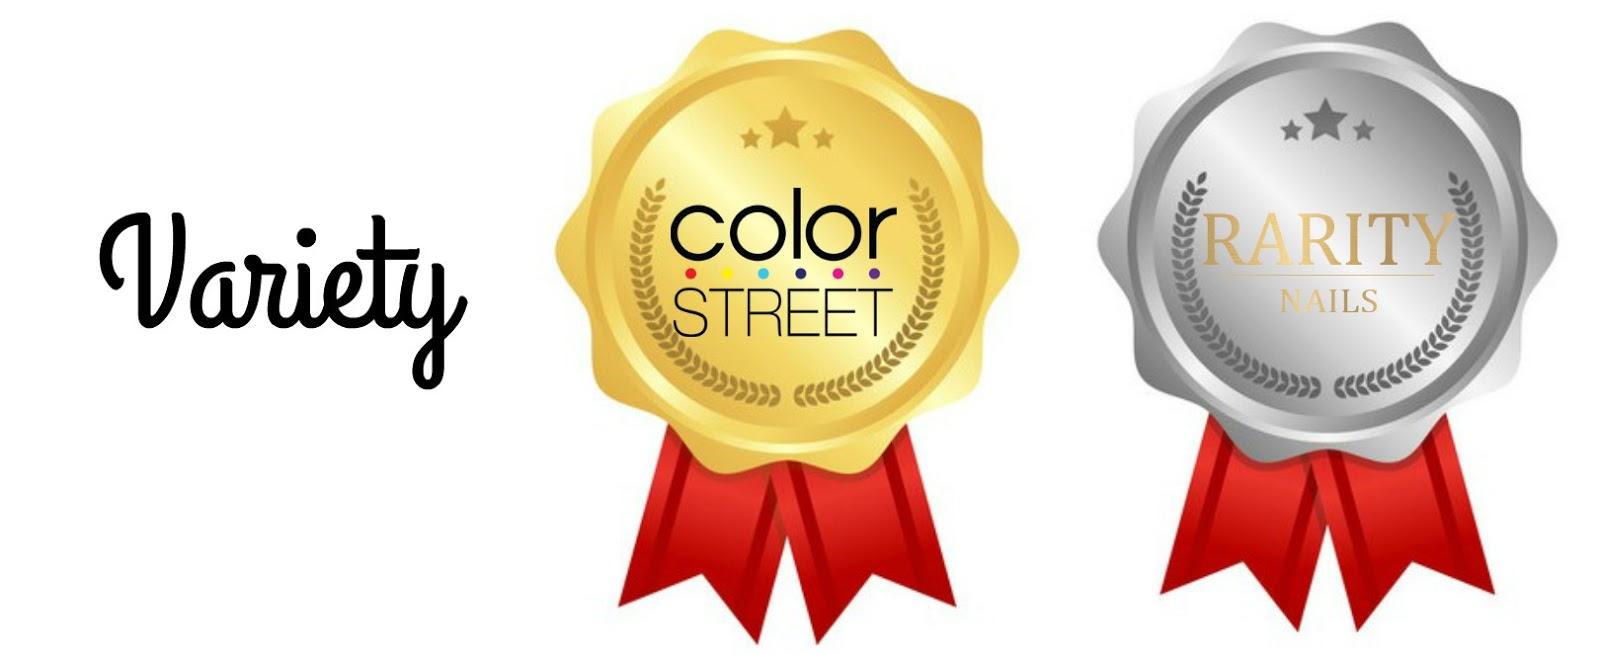 Beauty Blog By Angela Woodward Rarity Nails Vs Color Street